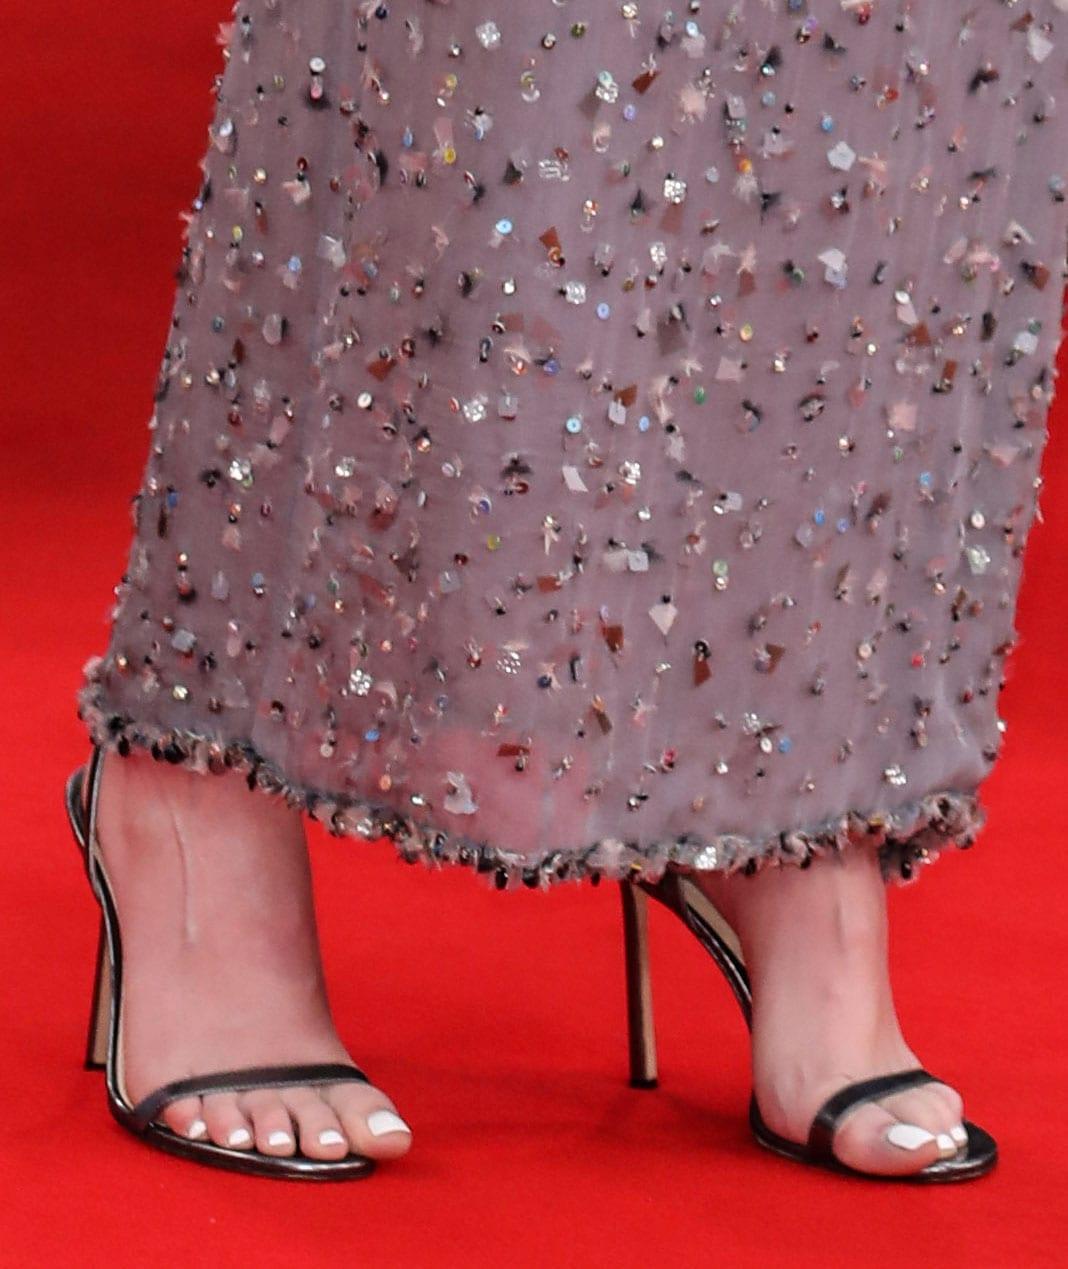 Kristen Stewart shows off her white pedicure in minimalist Jimmy Choo Minny sandals